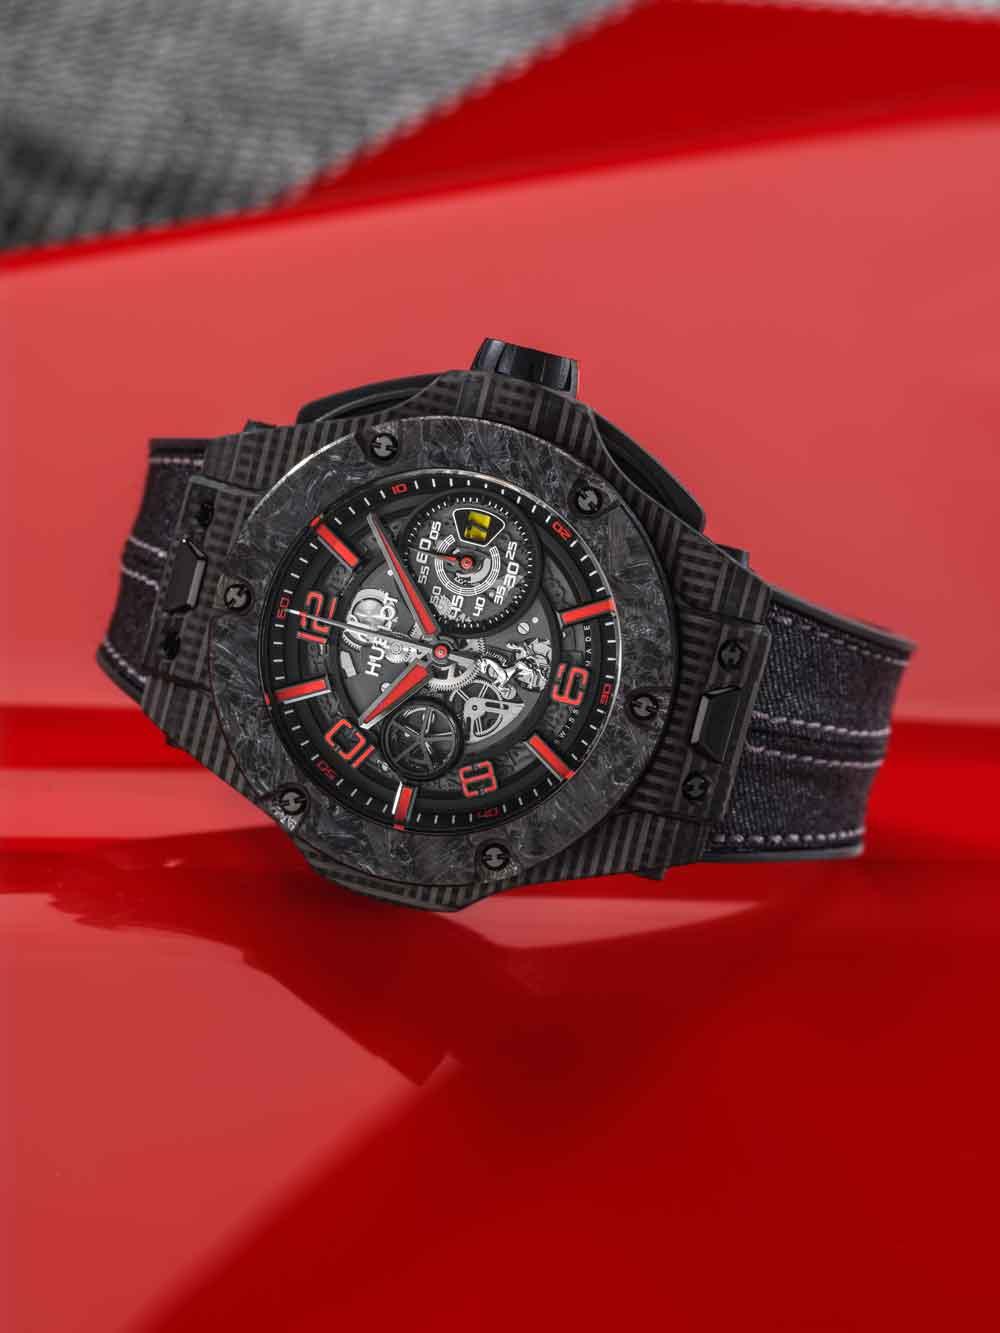 Reloj Hulbot Big Bang Scuderia Ferrari 90th Anniversary 3D Carbon Limited Edition